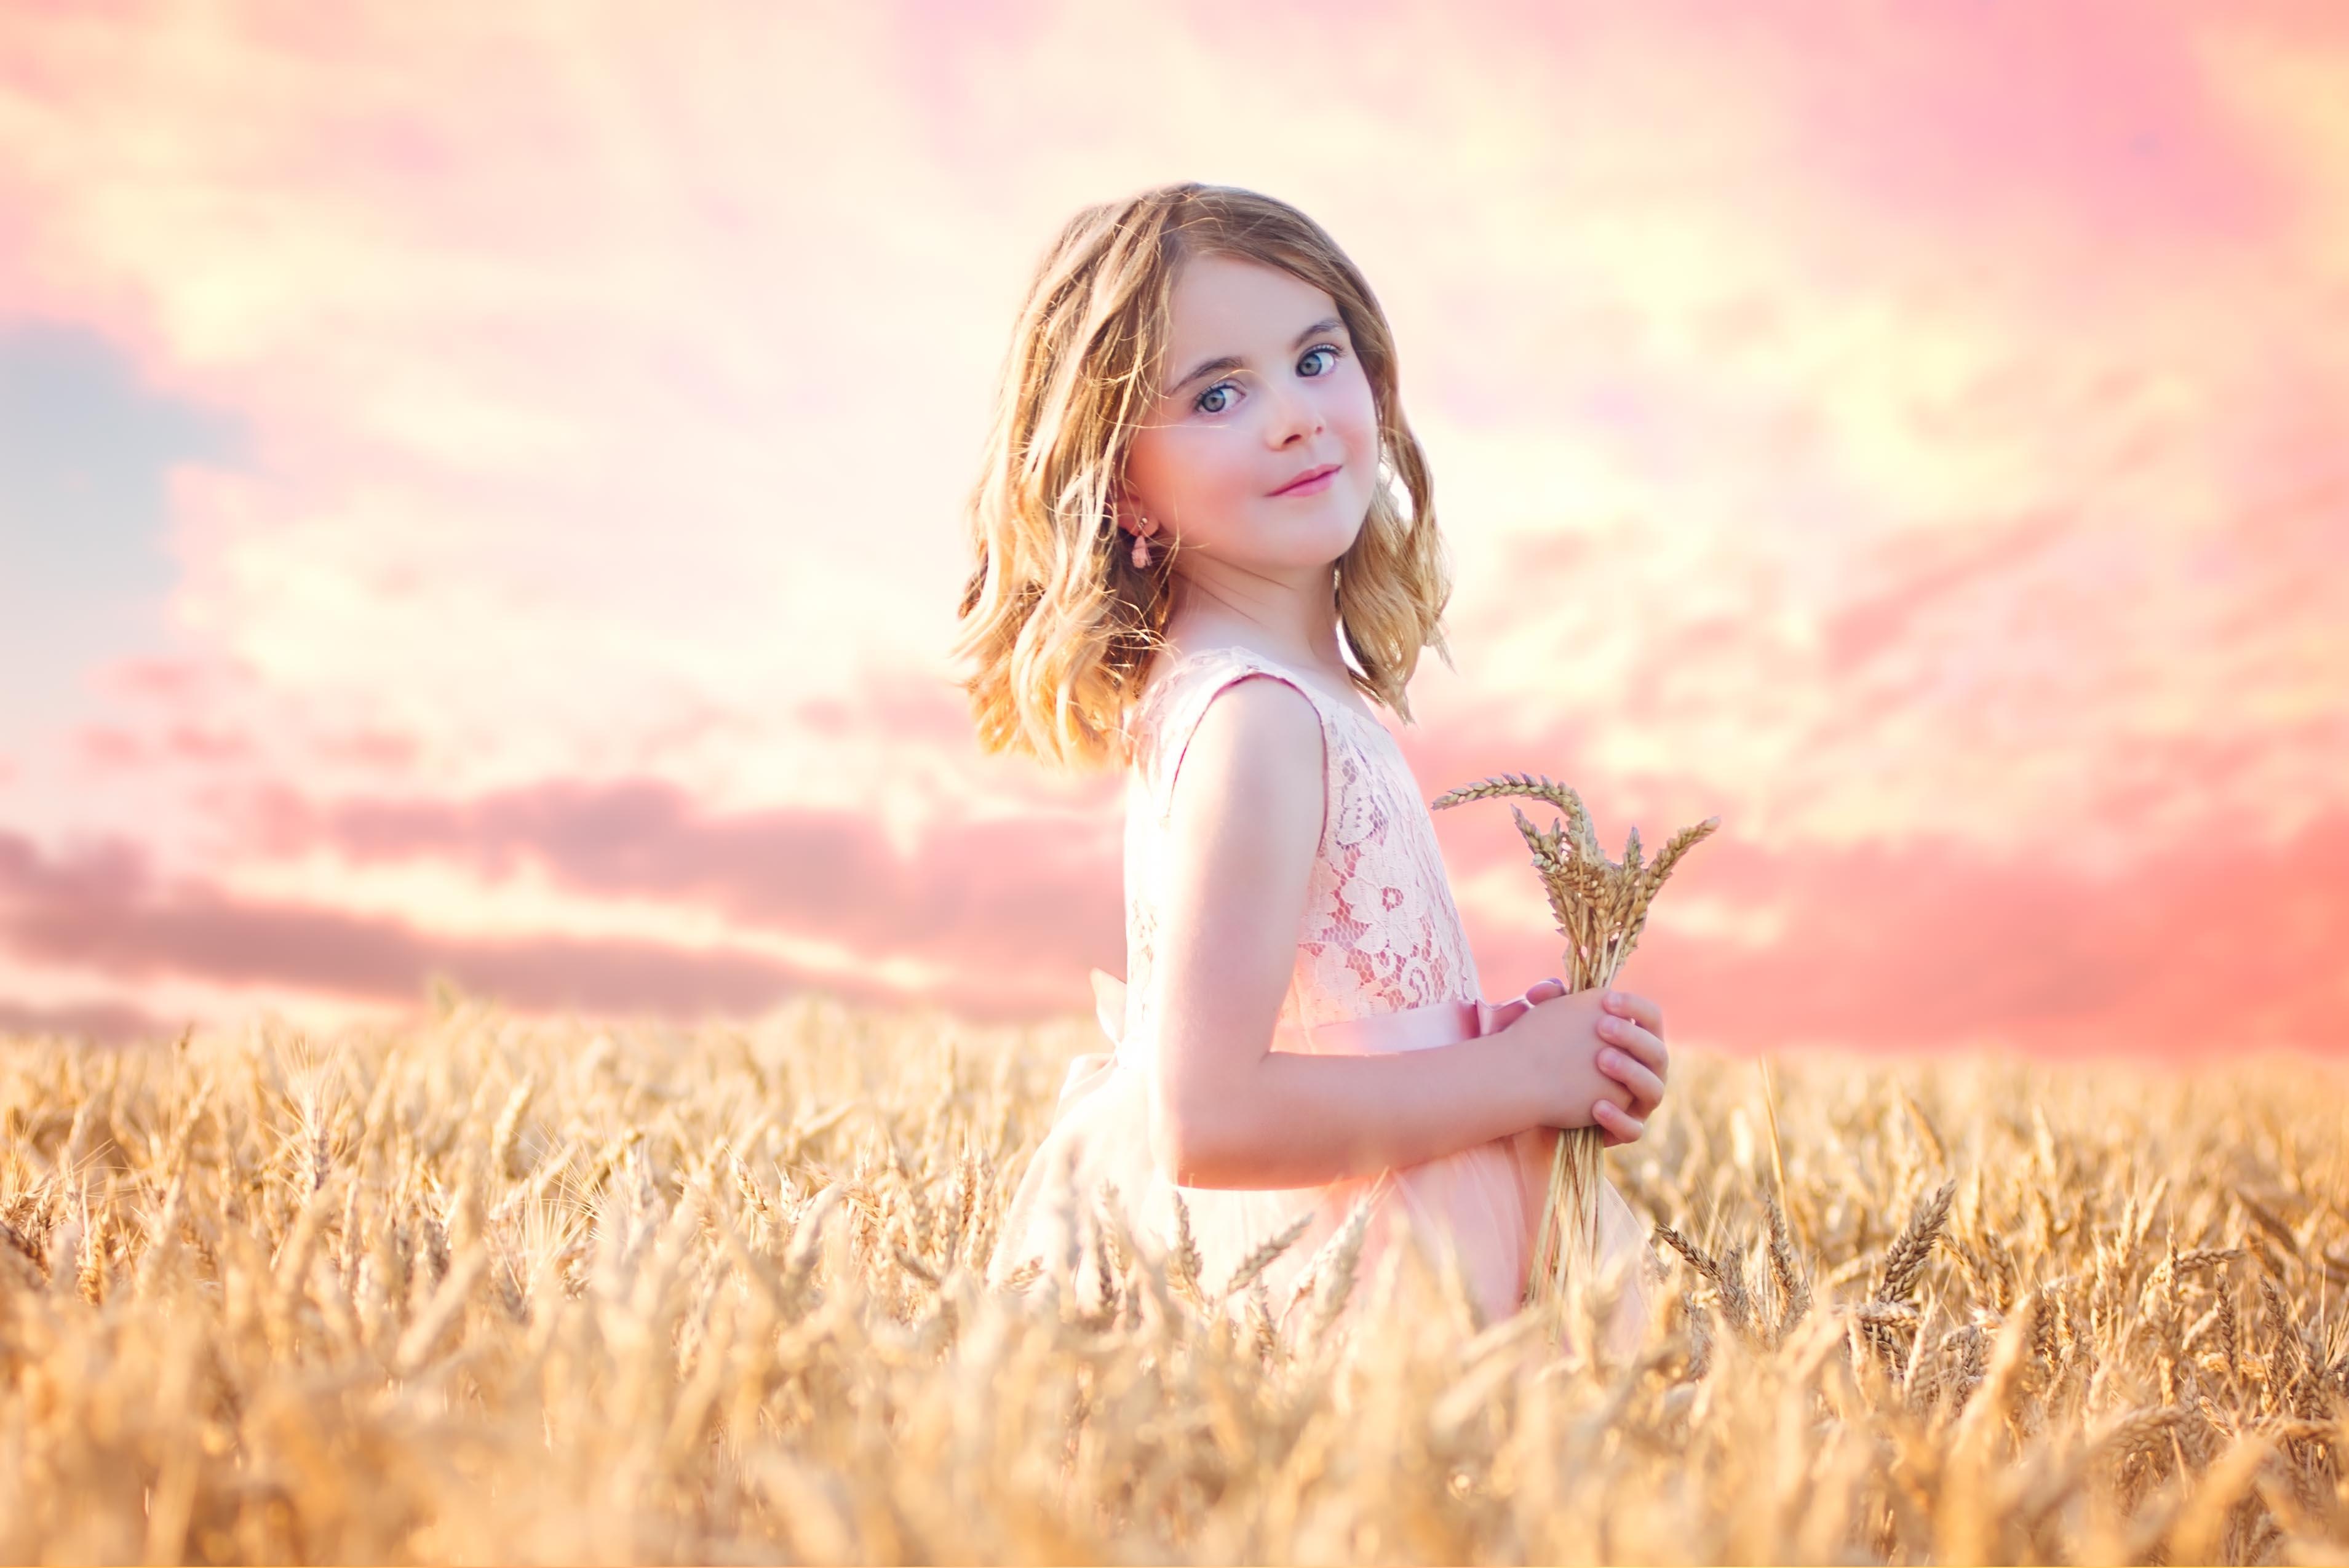 Photographe enfant Lille